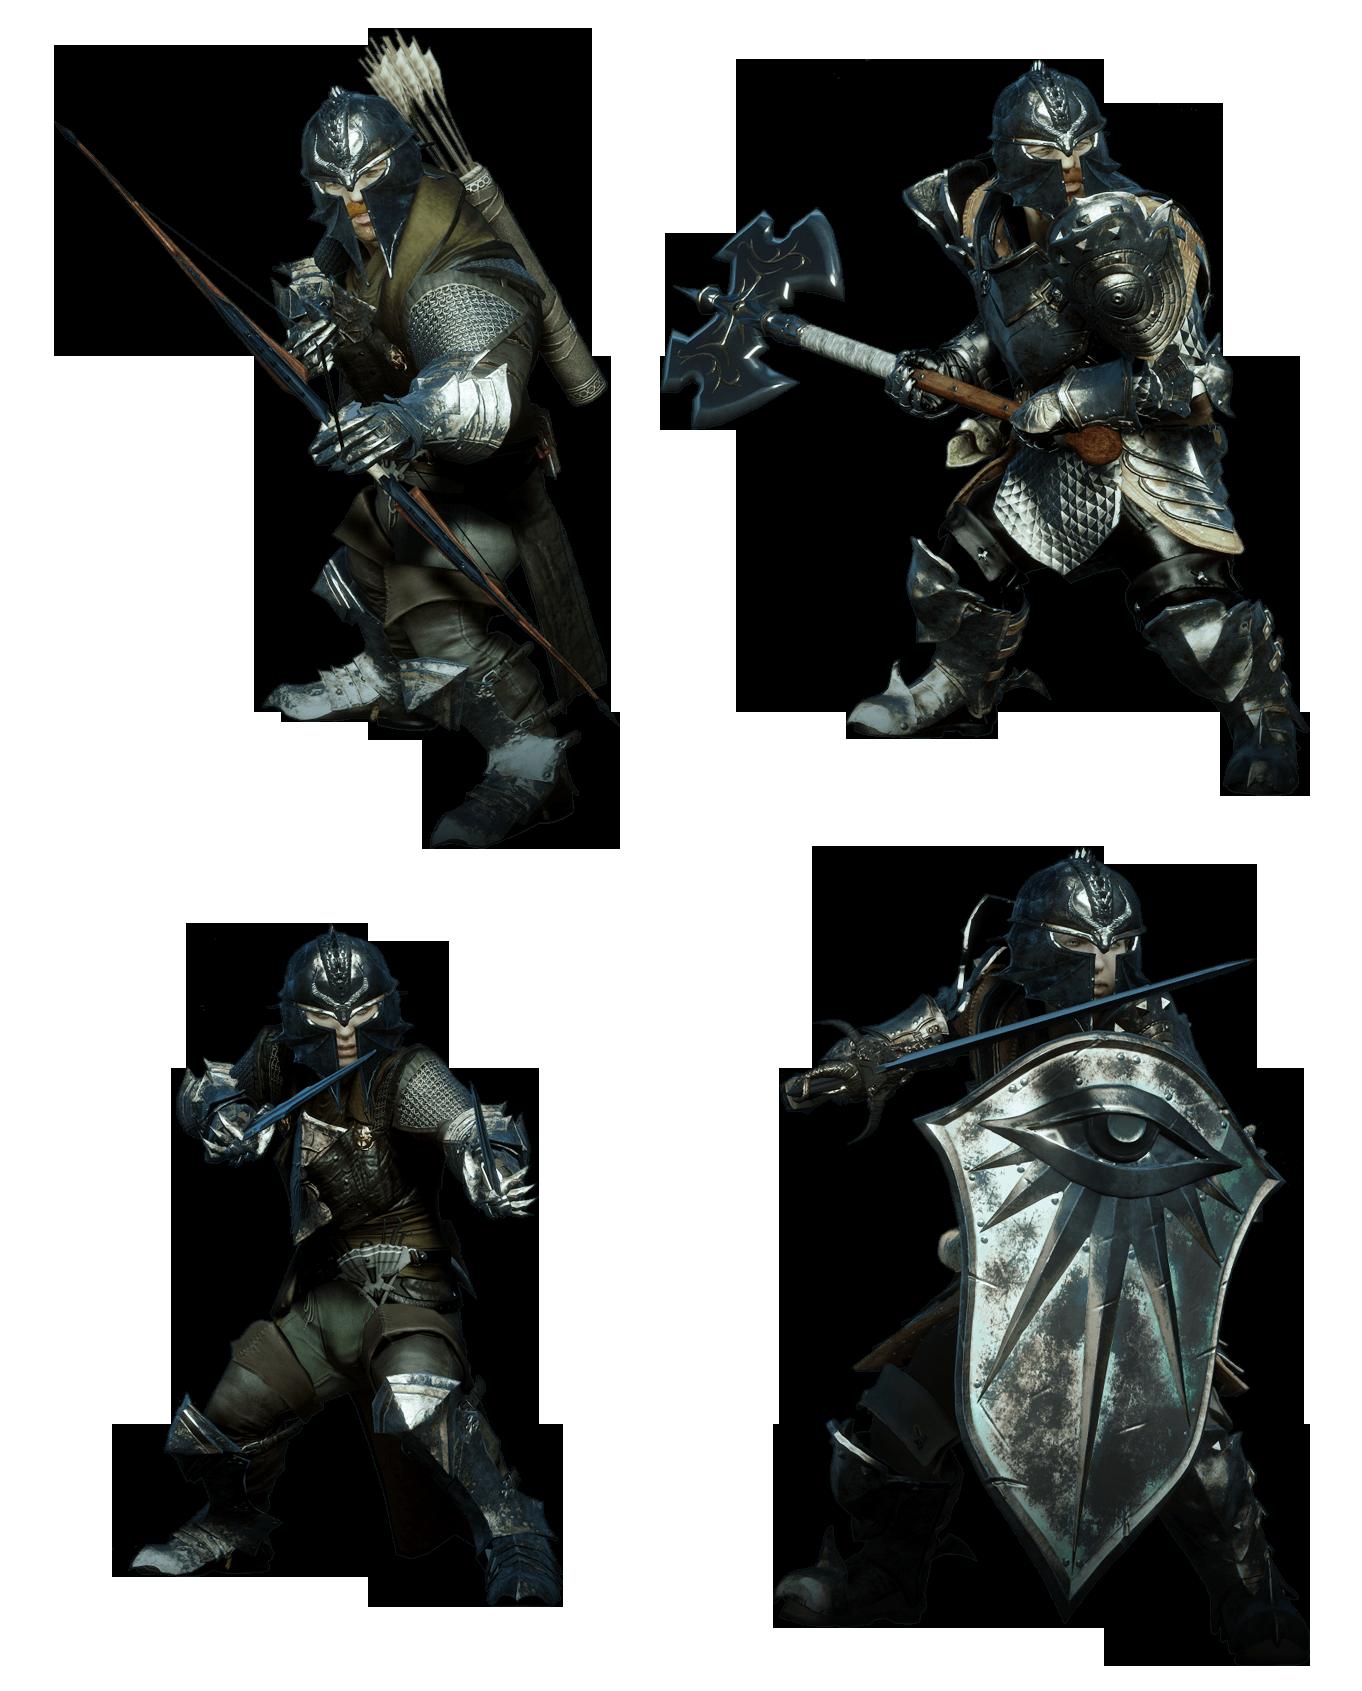 dwarf inquisitor models | Inquisitors in 2019 | Dragon age, Dragon